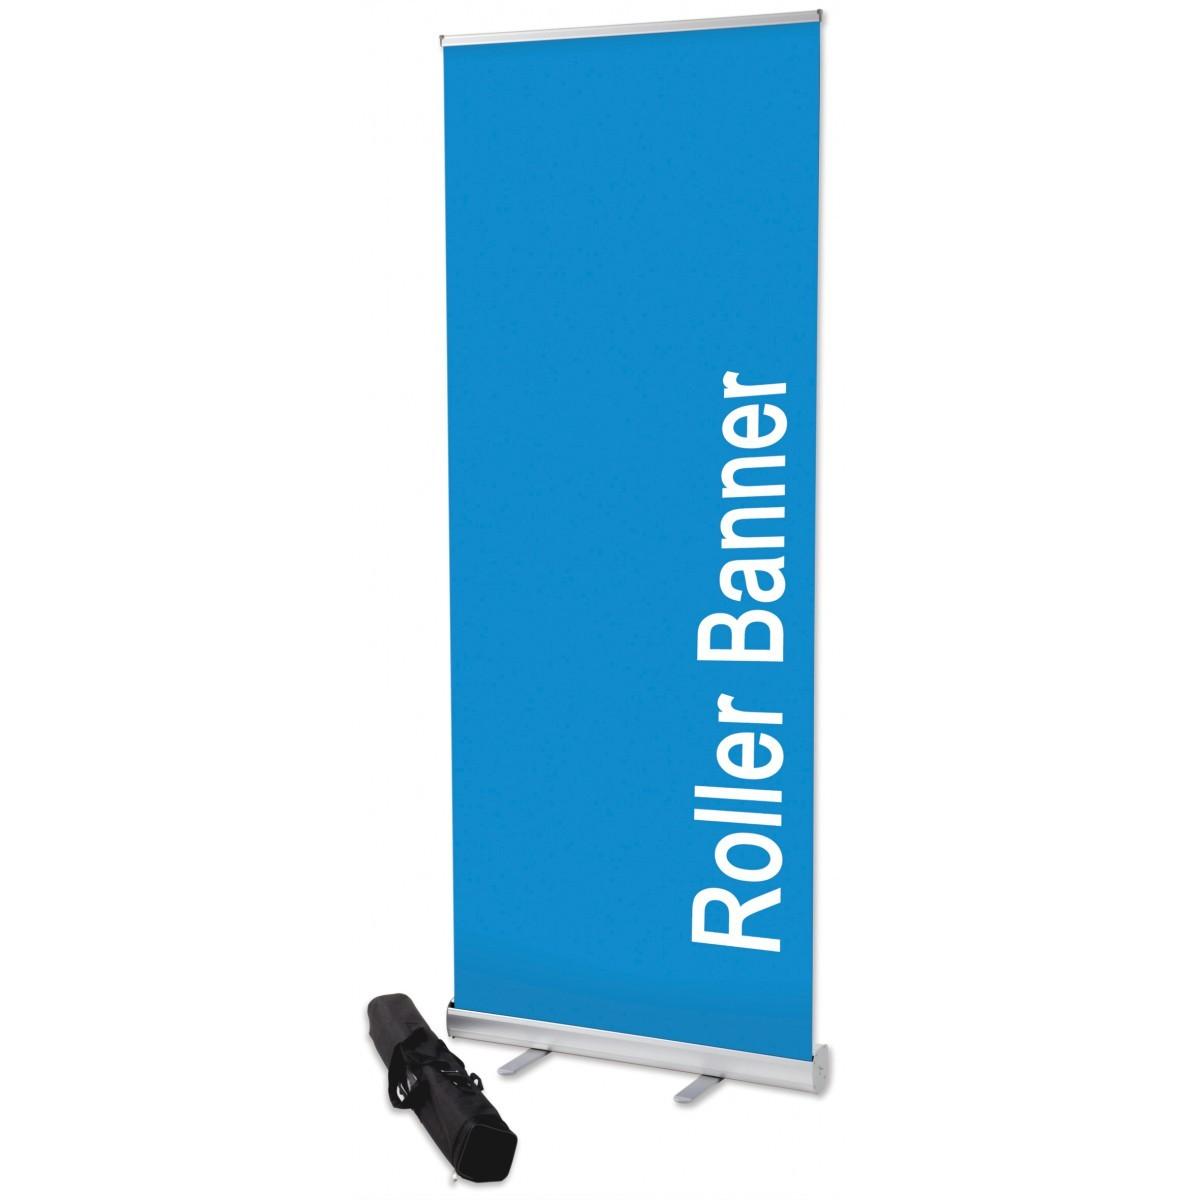 Pop Up And Go 7 Benefits Of Pop Up Banner Stands